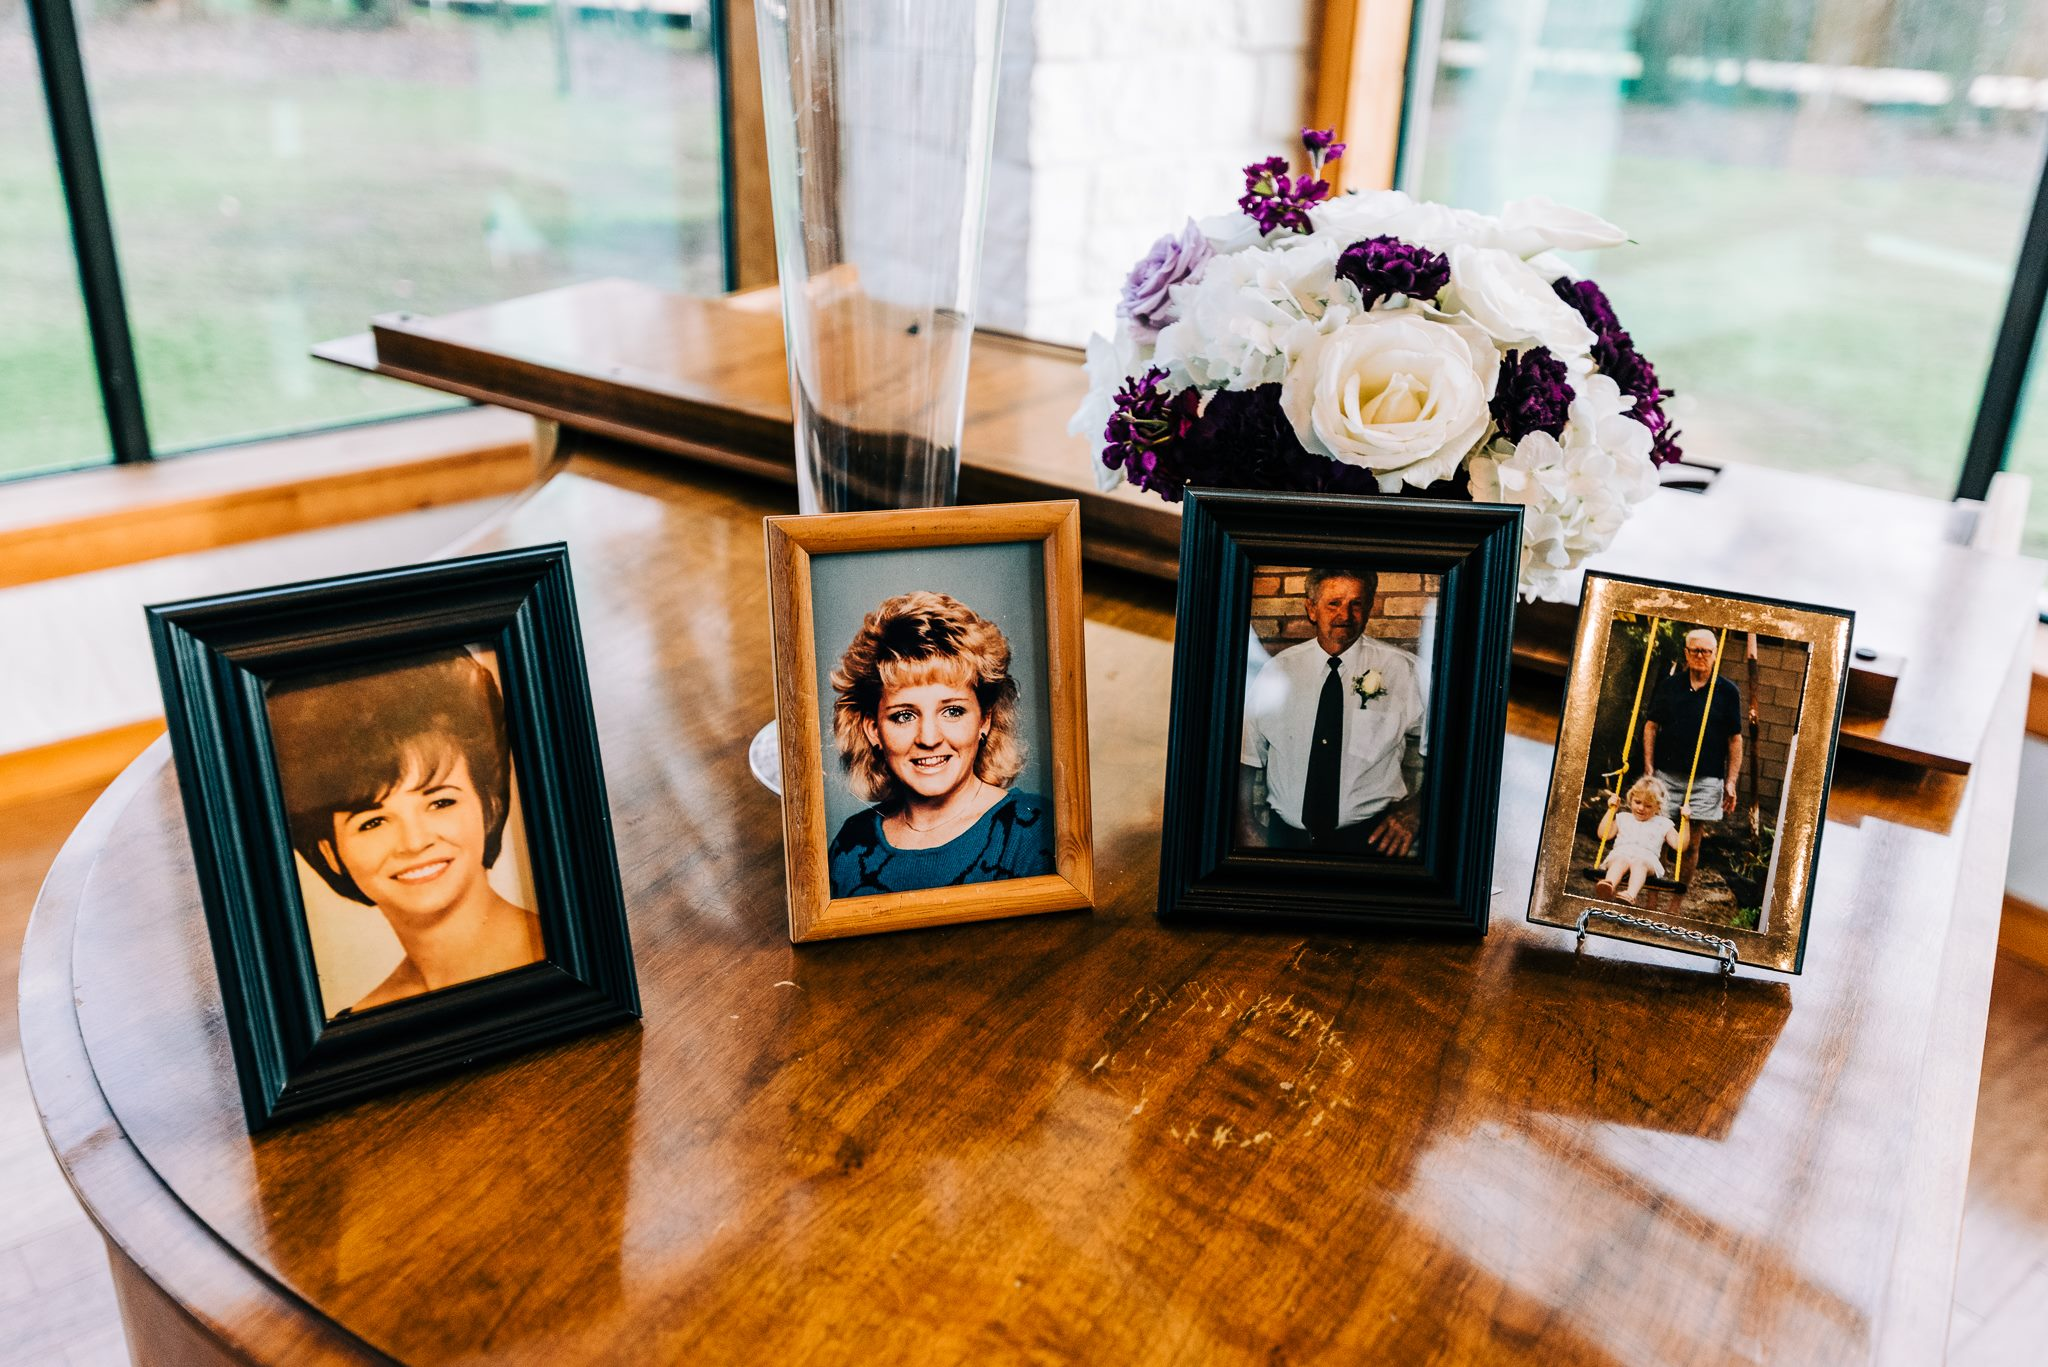 North-Texas-Wedding-Florist-David-Co.-Harmony-Chapel11.jpg